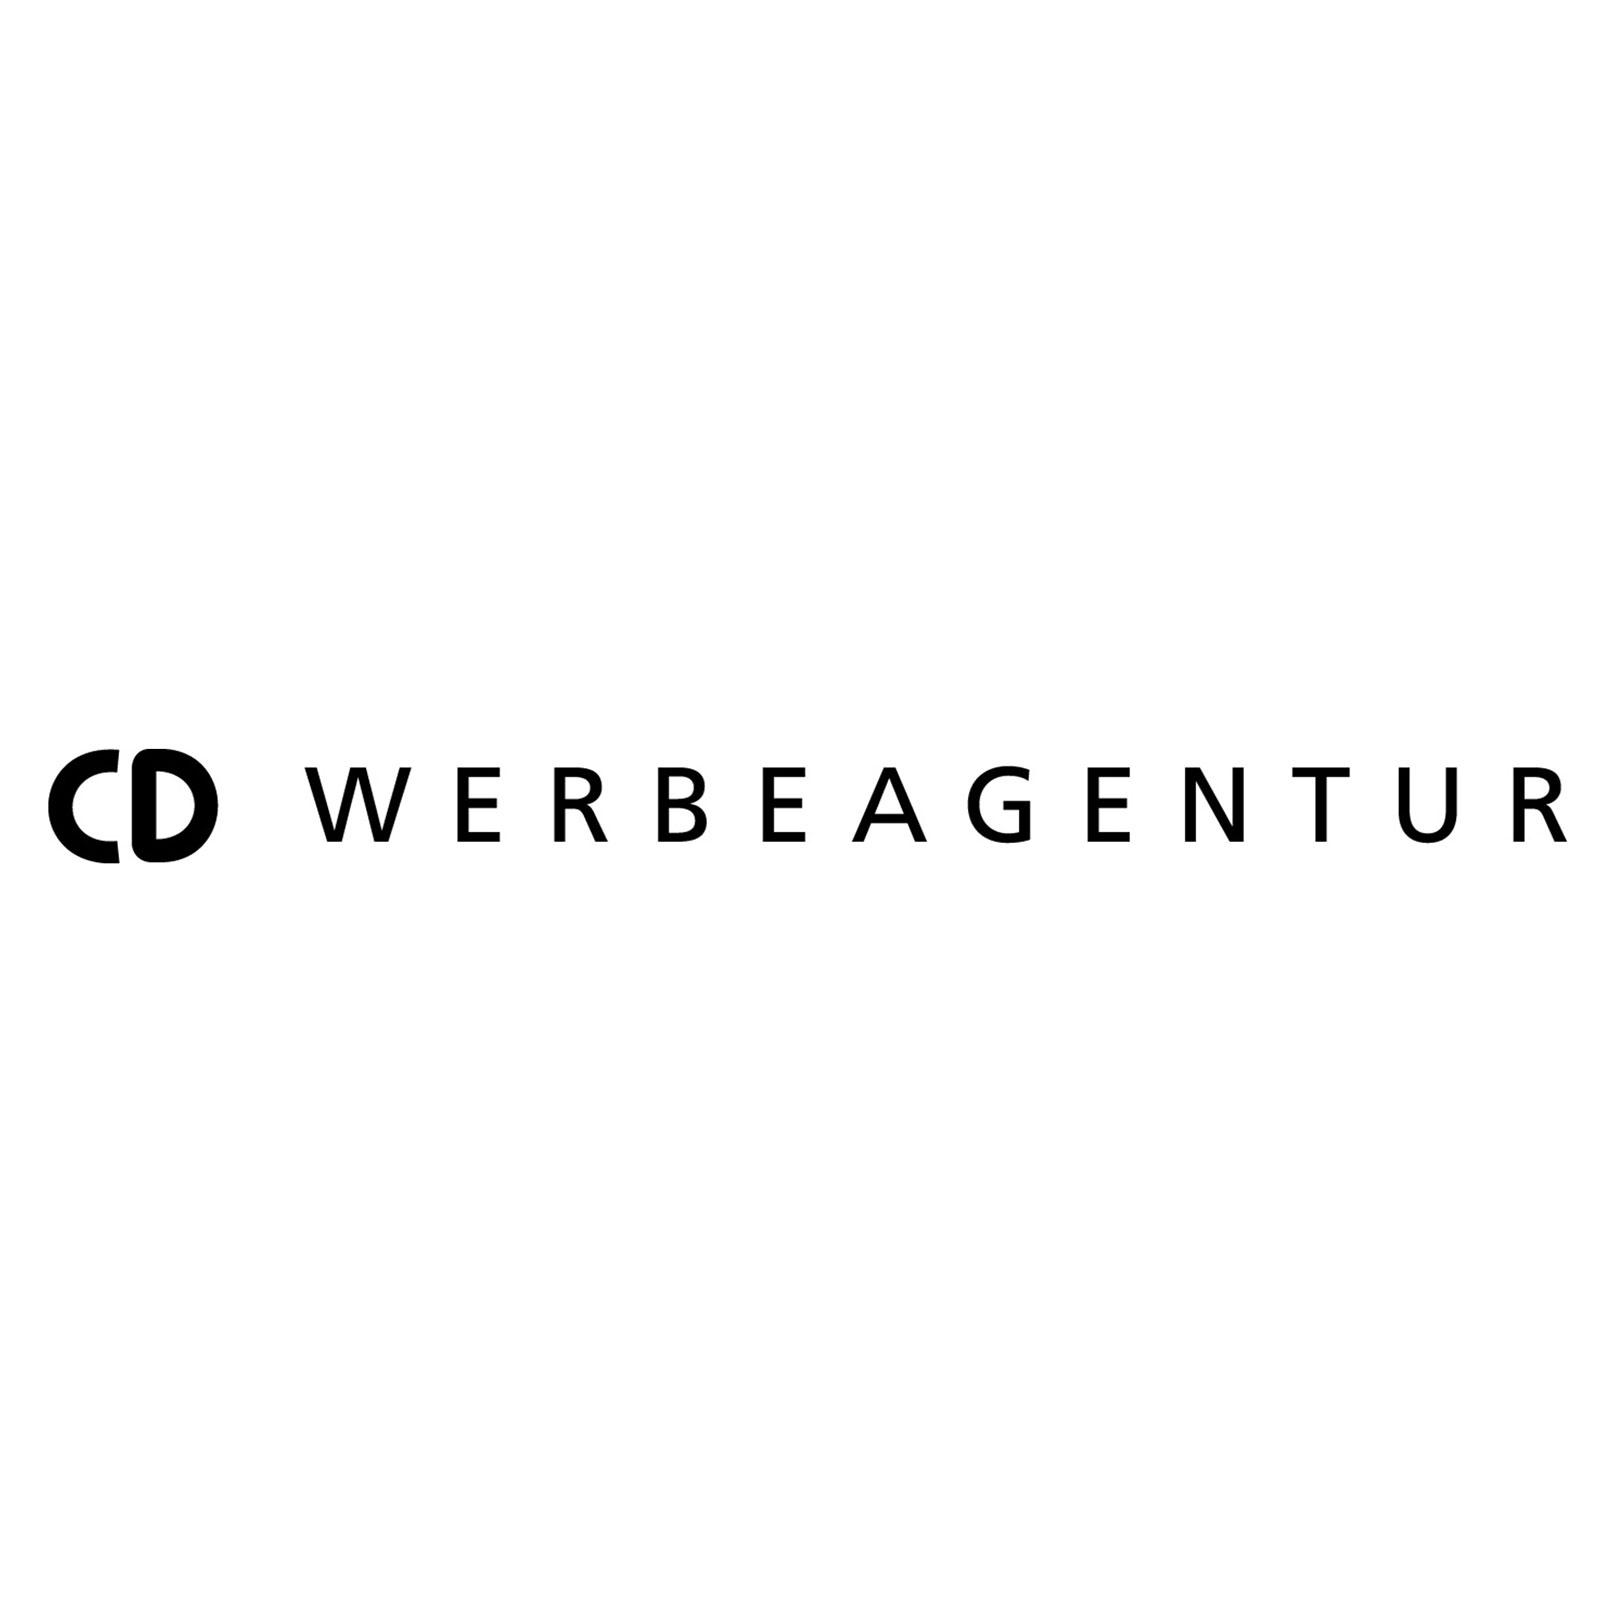 logo_cd_werbeagentur-1